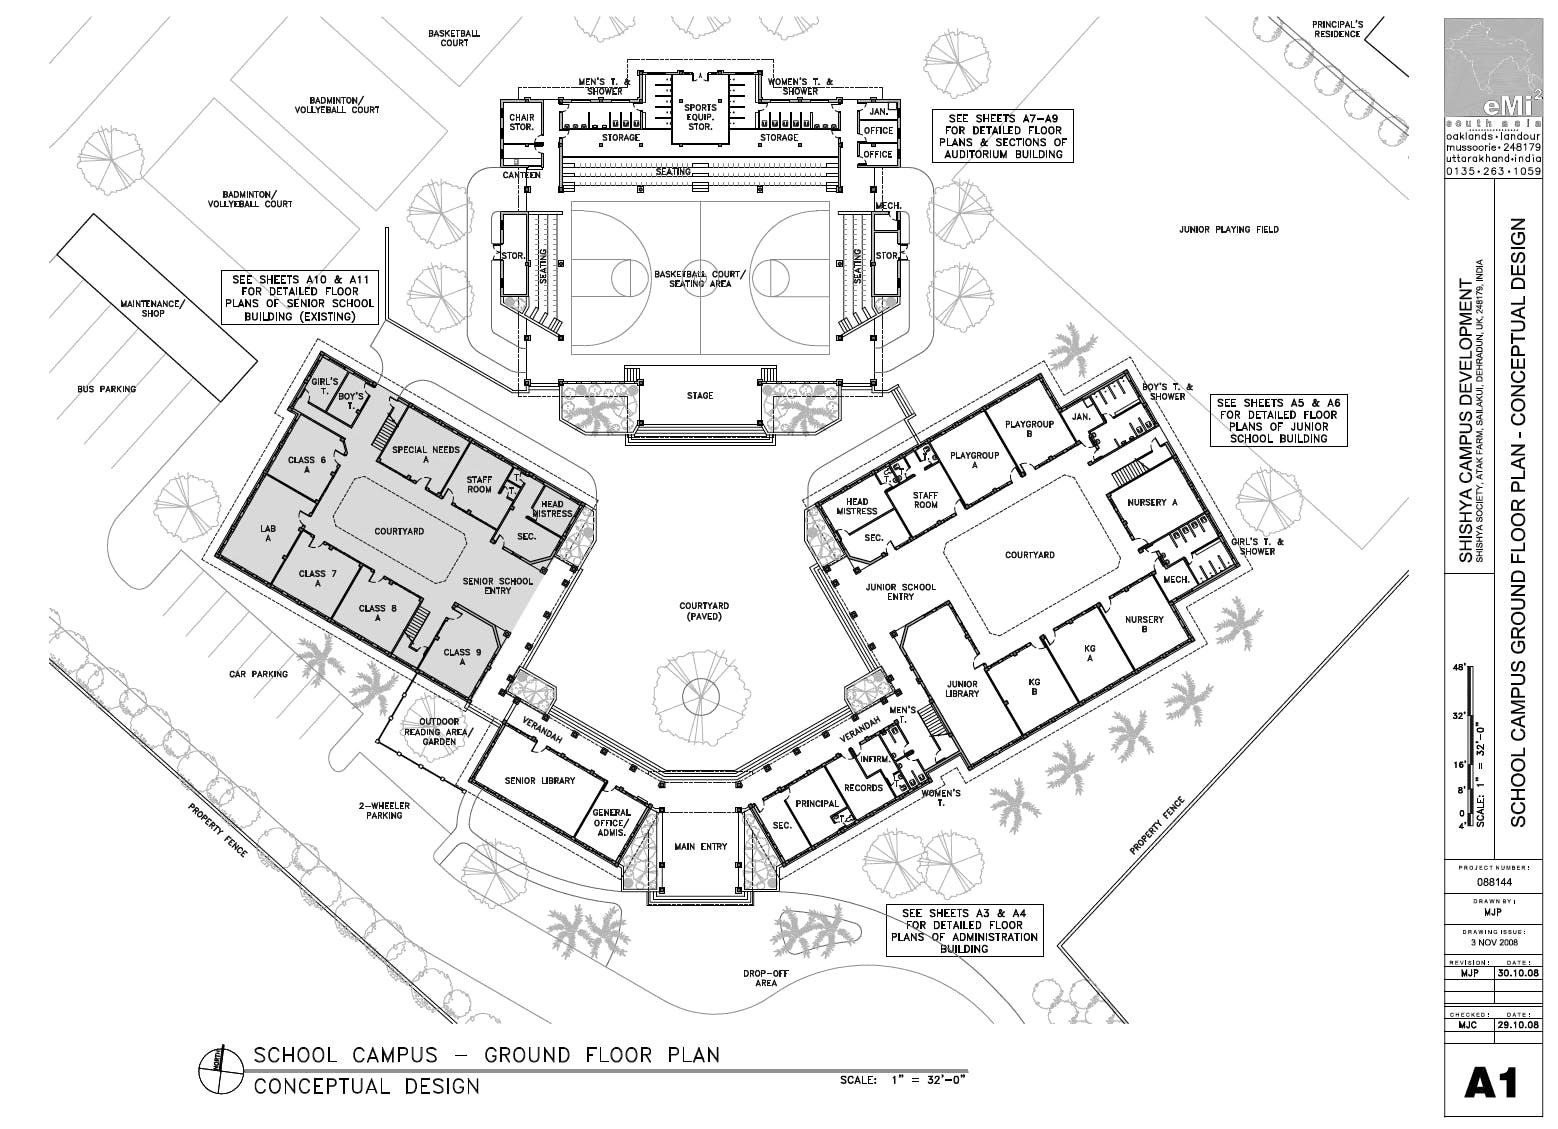 campus master plan  u0026 school design for shishya society